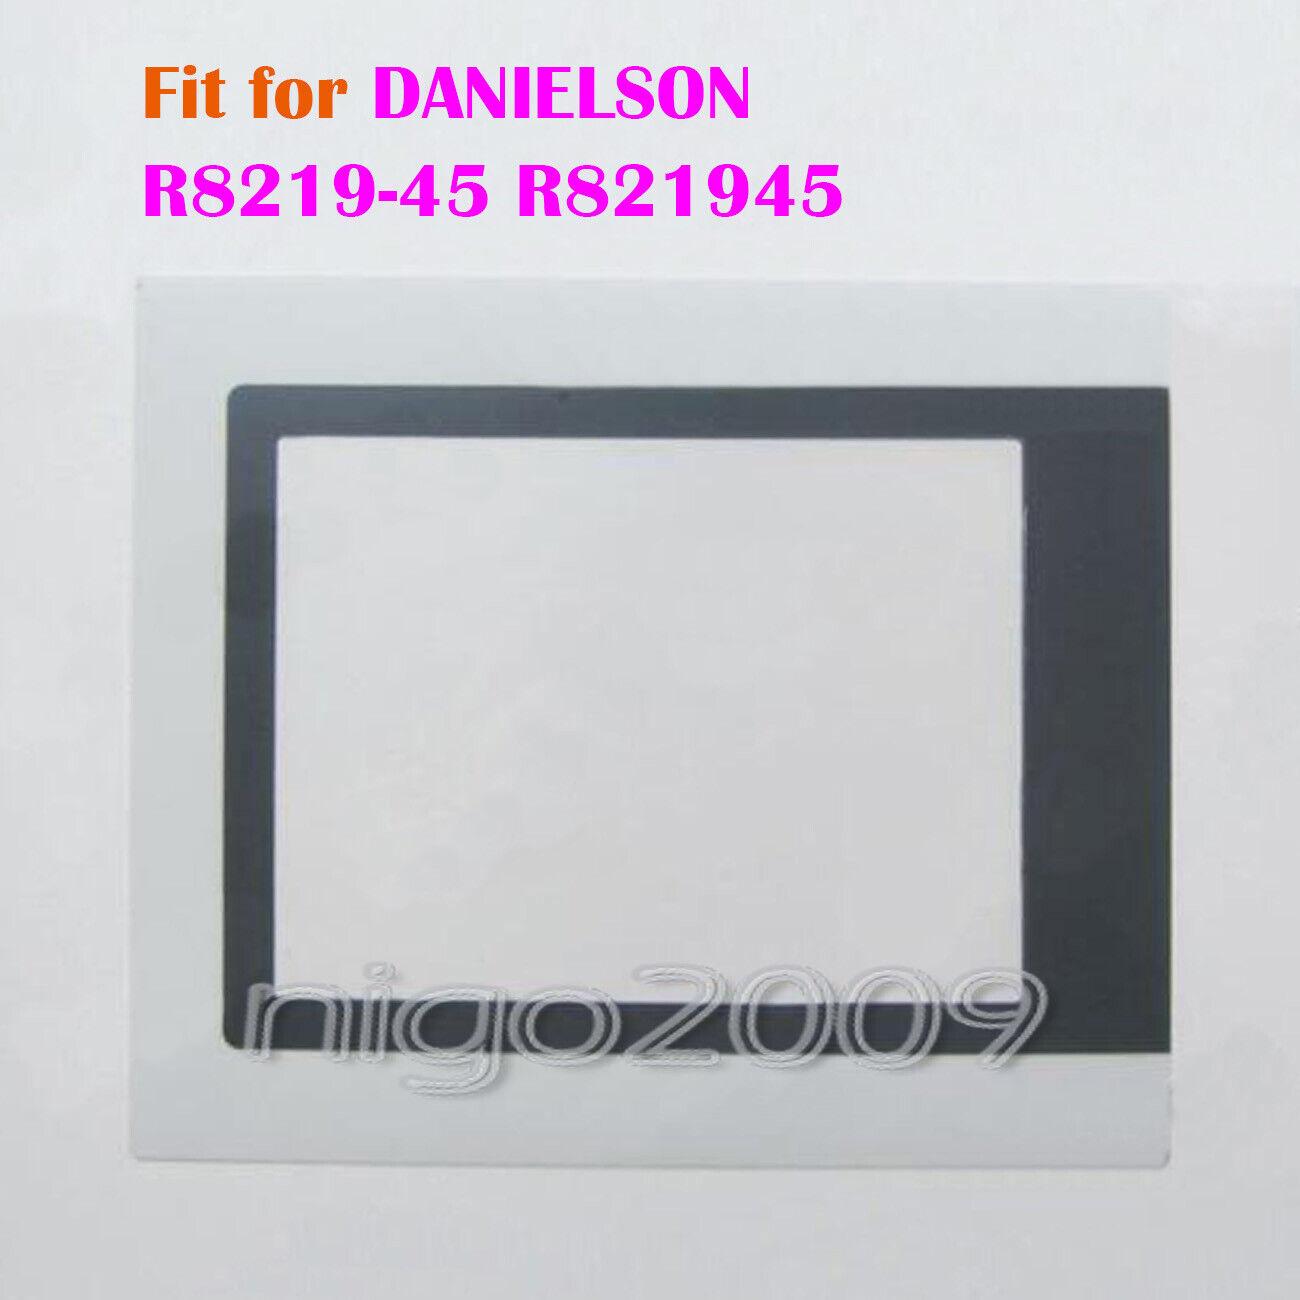 New For DANIELSON R8219-45  R821945  R 8219-45 Predective Film 1 Year Warranty